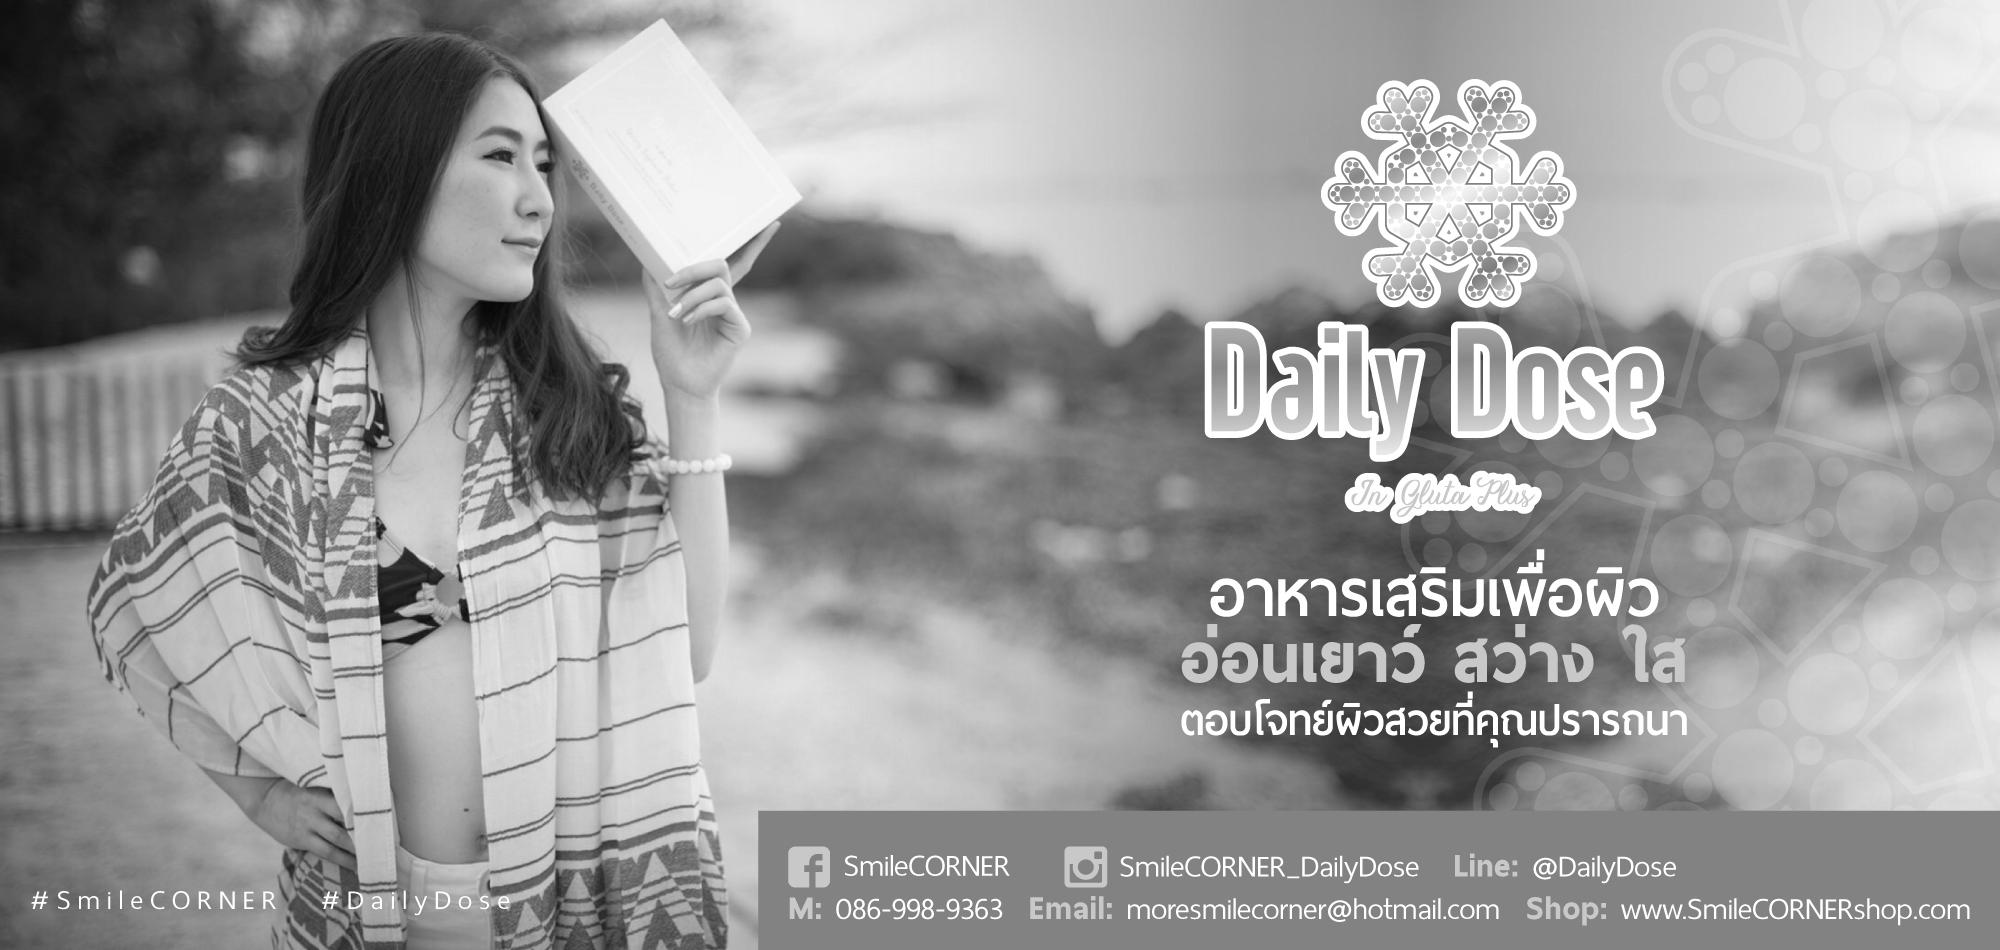 SmileCORNERshop : ตัวแทนจำหน่าย Daily Dose อาหารเสริมเพื่อผิว อ่อนเยาว์ สว่าง ใส